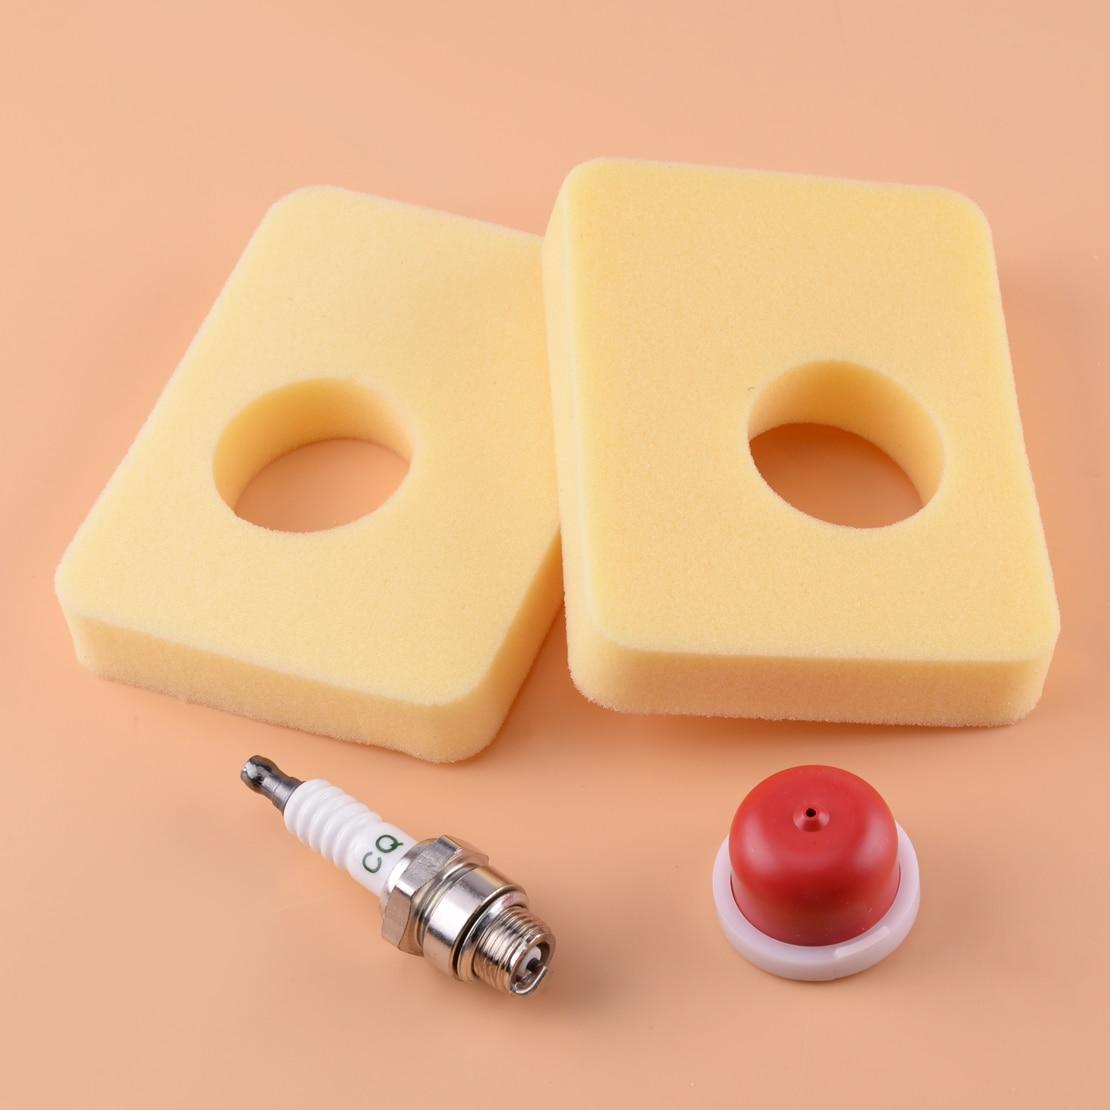 LETAOSK motor filtro de aire Primer bulbo 799579 ajuste para 594281 F Briggs & Stratton 300e 450e 500e Series de repuesto herramientas de jardín